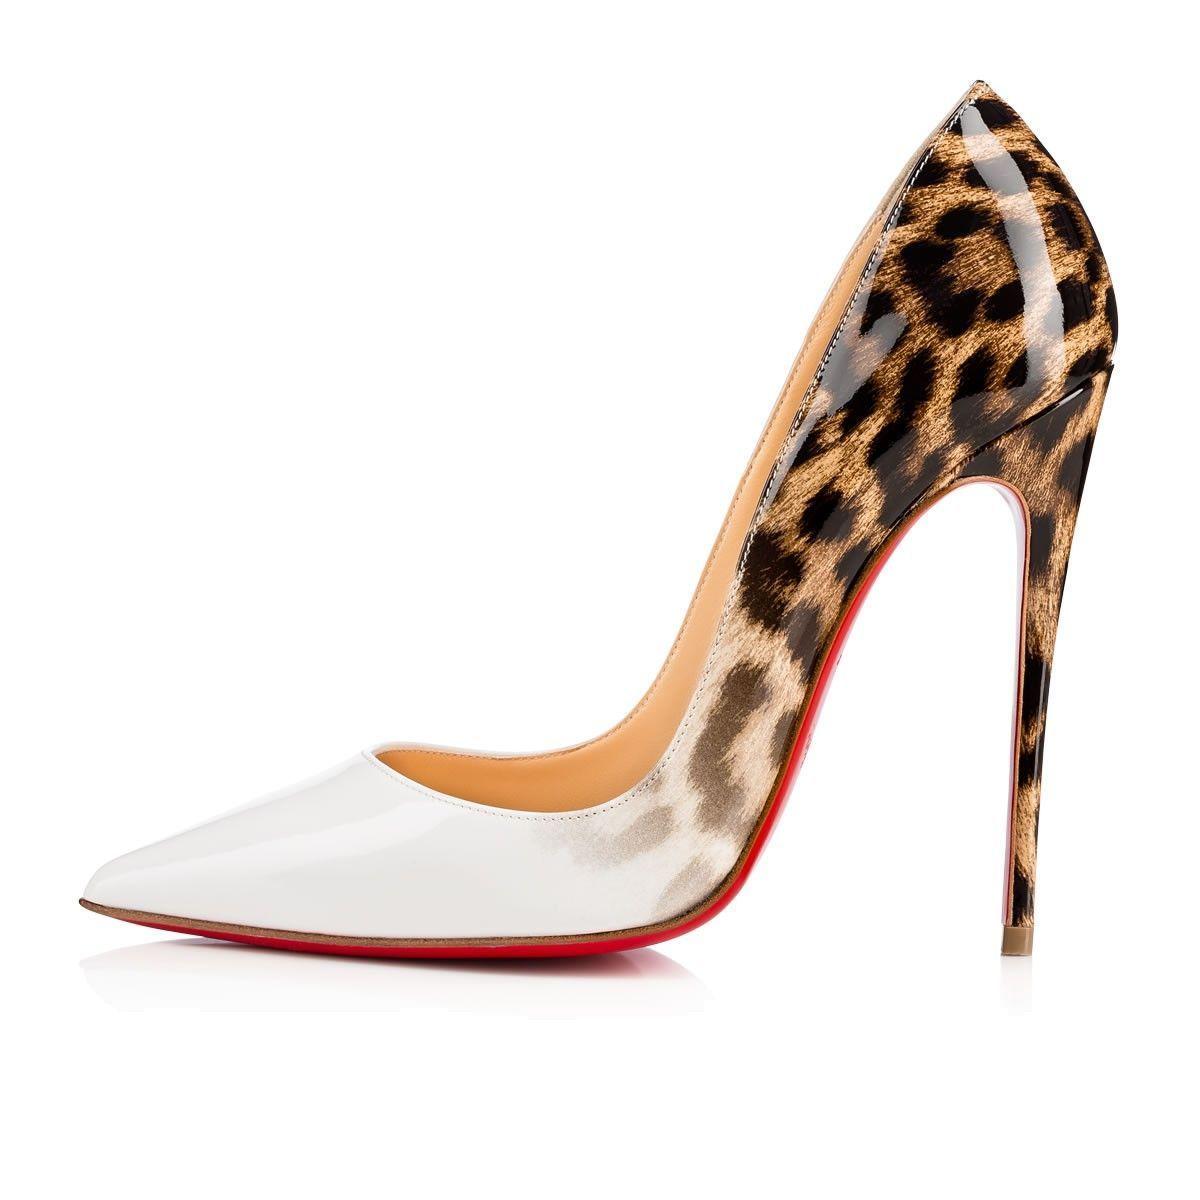 9a52e91f1dd Shoes - So Kate - Christian Louboutin   Christian Louboutin in 2019 ...